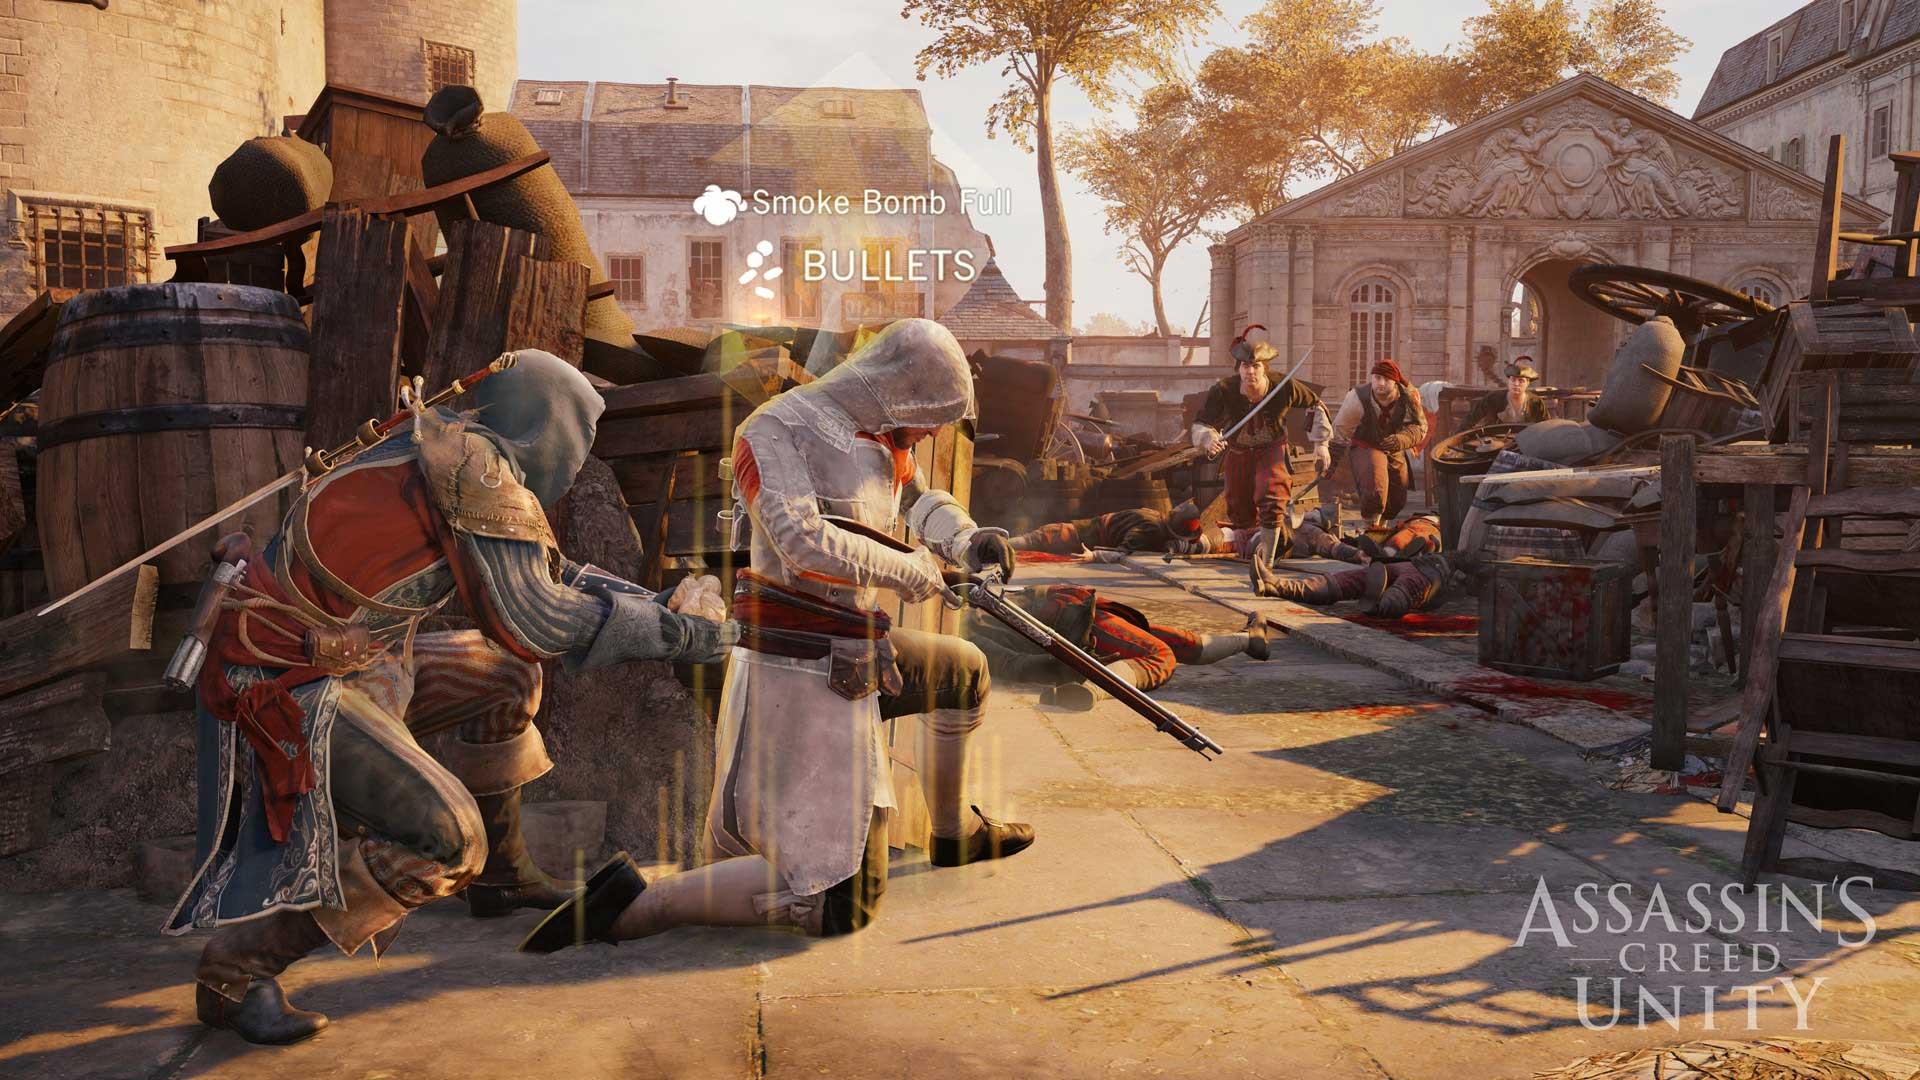 Assassins-Creed-Unity-(3)